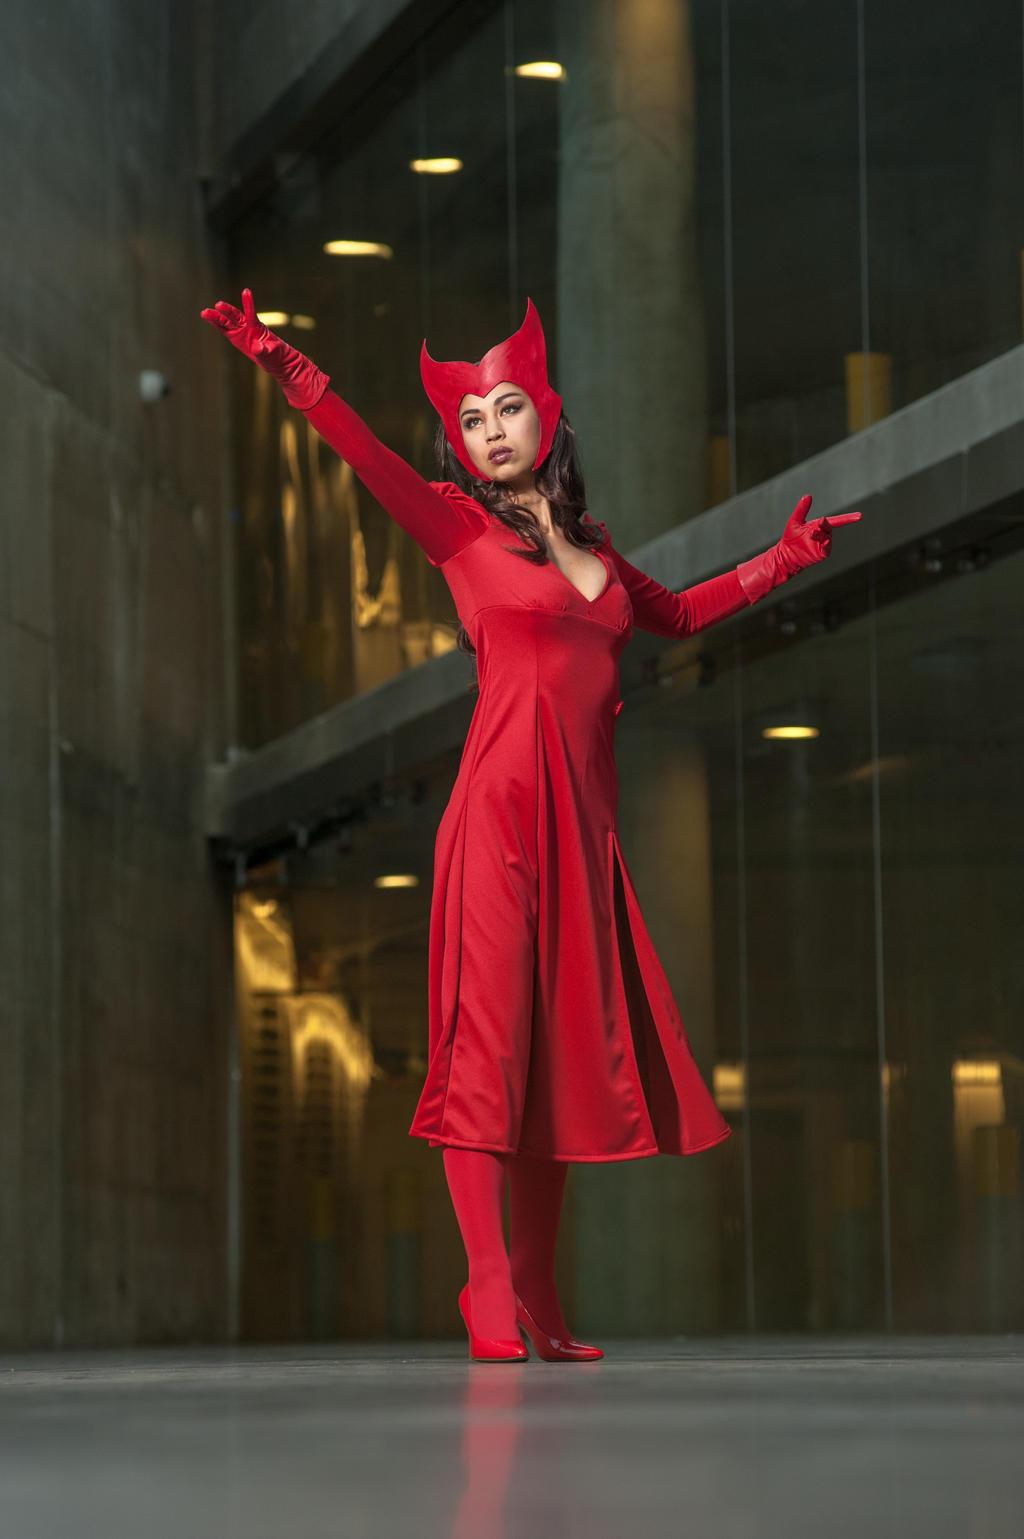 Vanessa Scarlet Witch 1a by jagged-eye on DeviantArt